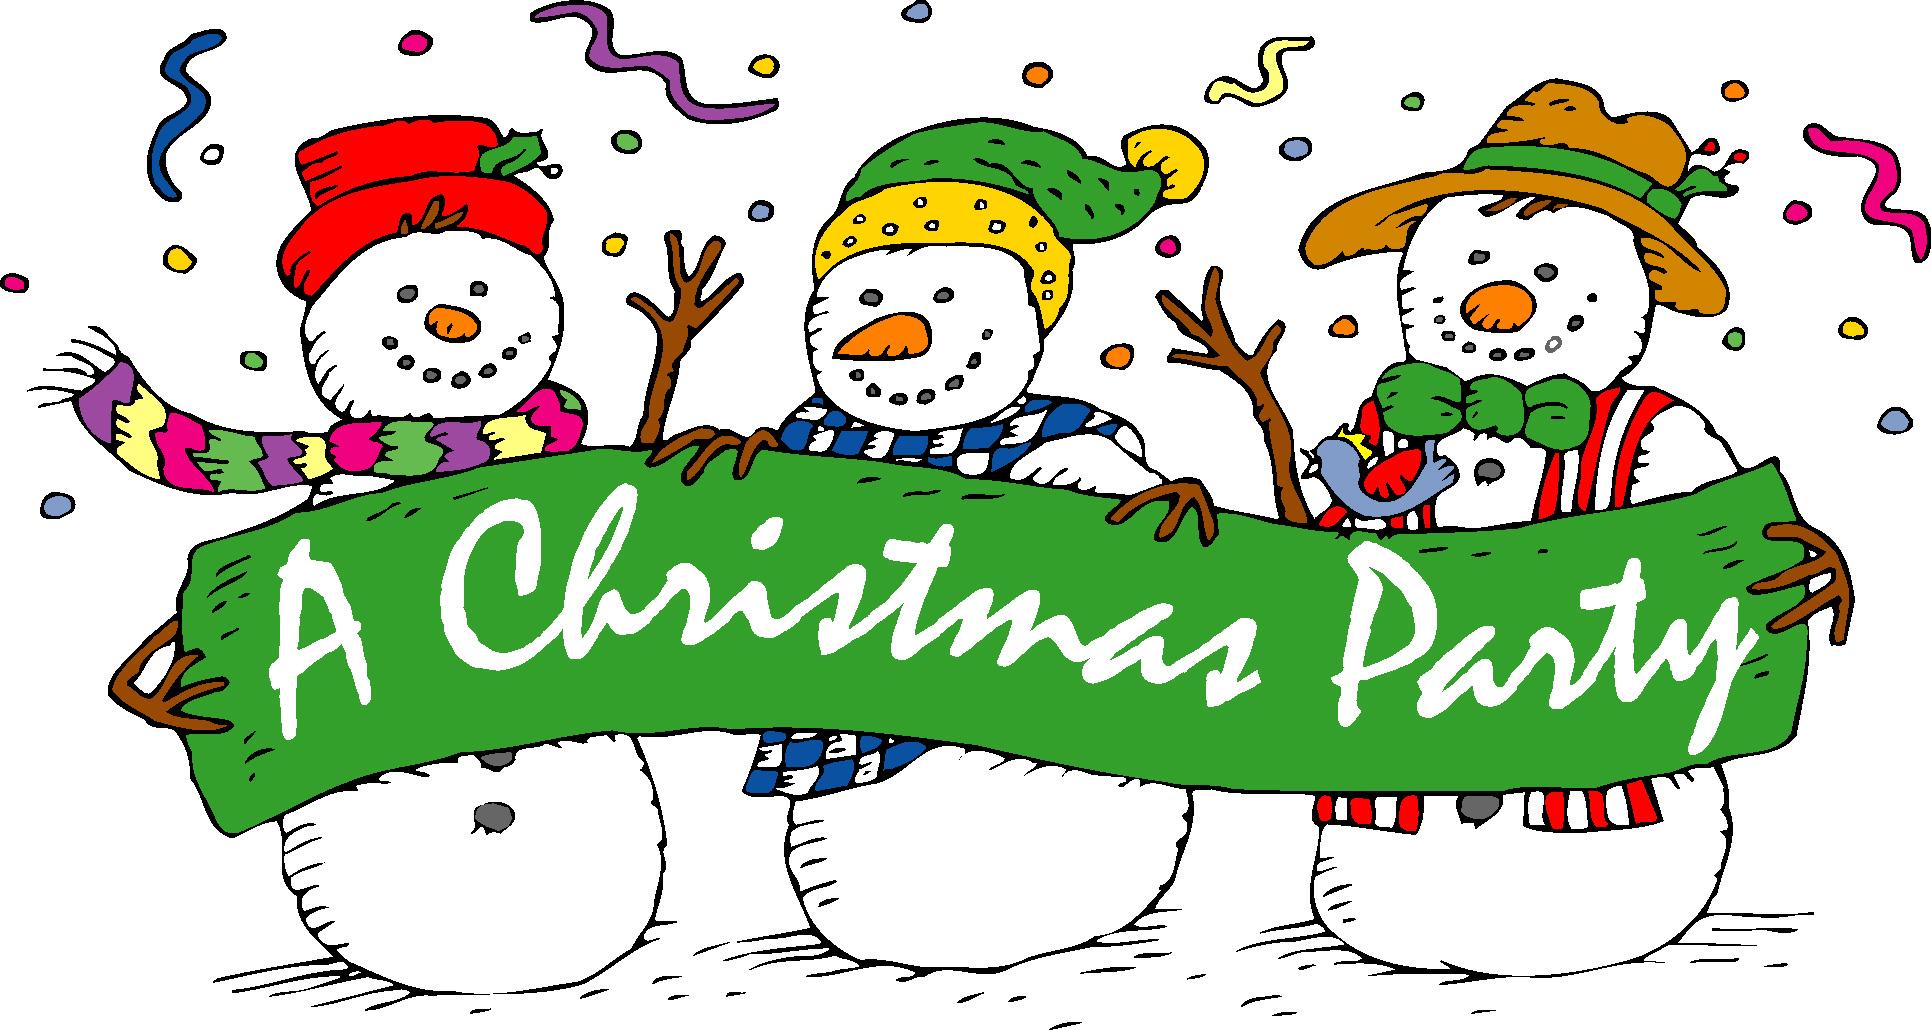 Organize Your Christmas Party At Kidsworld Sxm Kidsworld Sxm